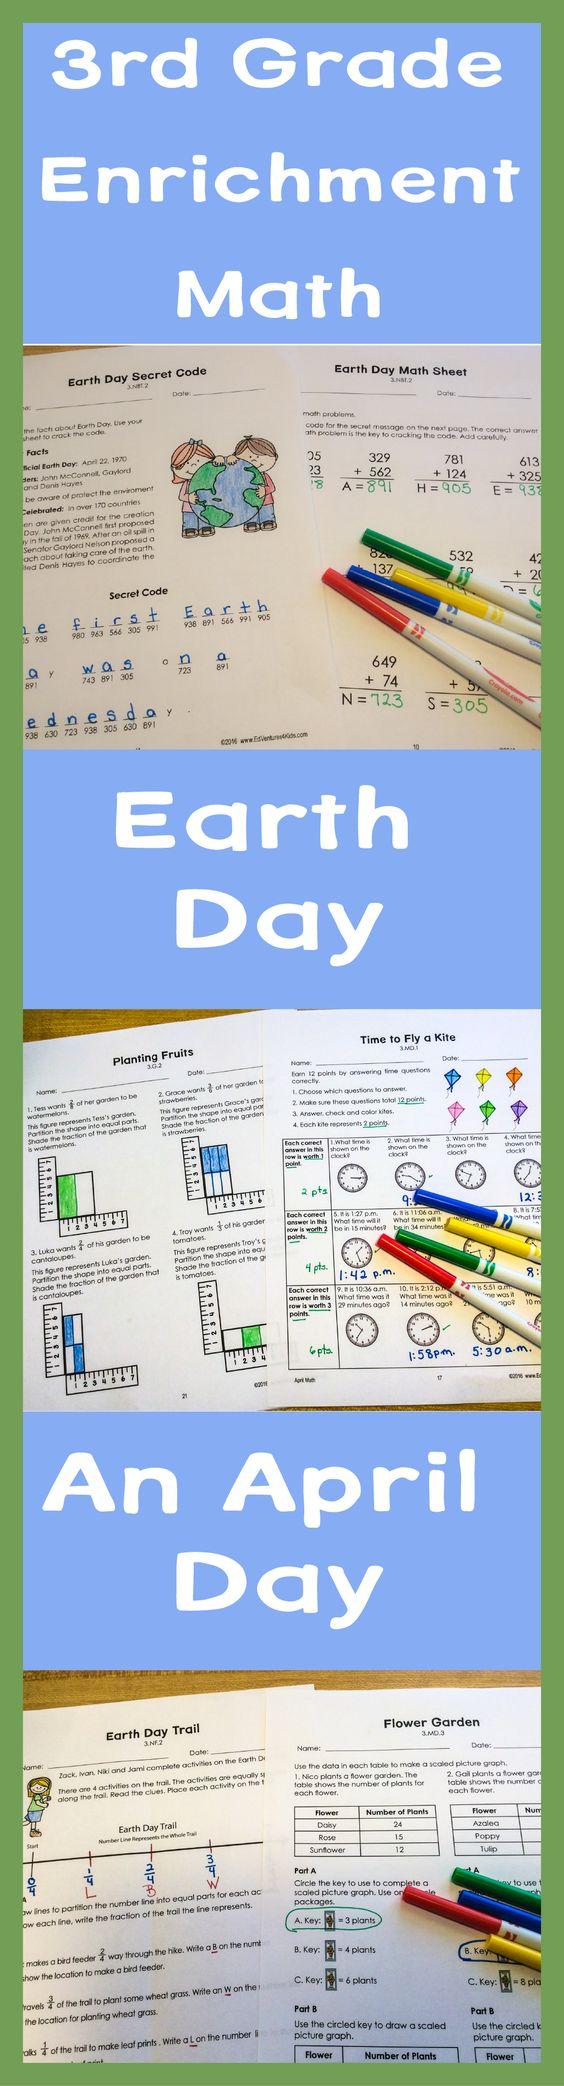 April Math: Enrichment Math for 3rd Grade | Math enrichment ...